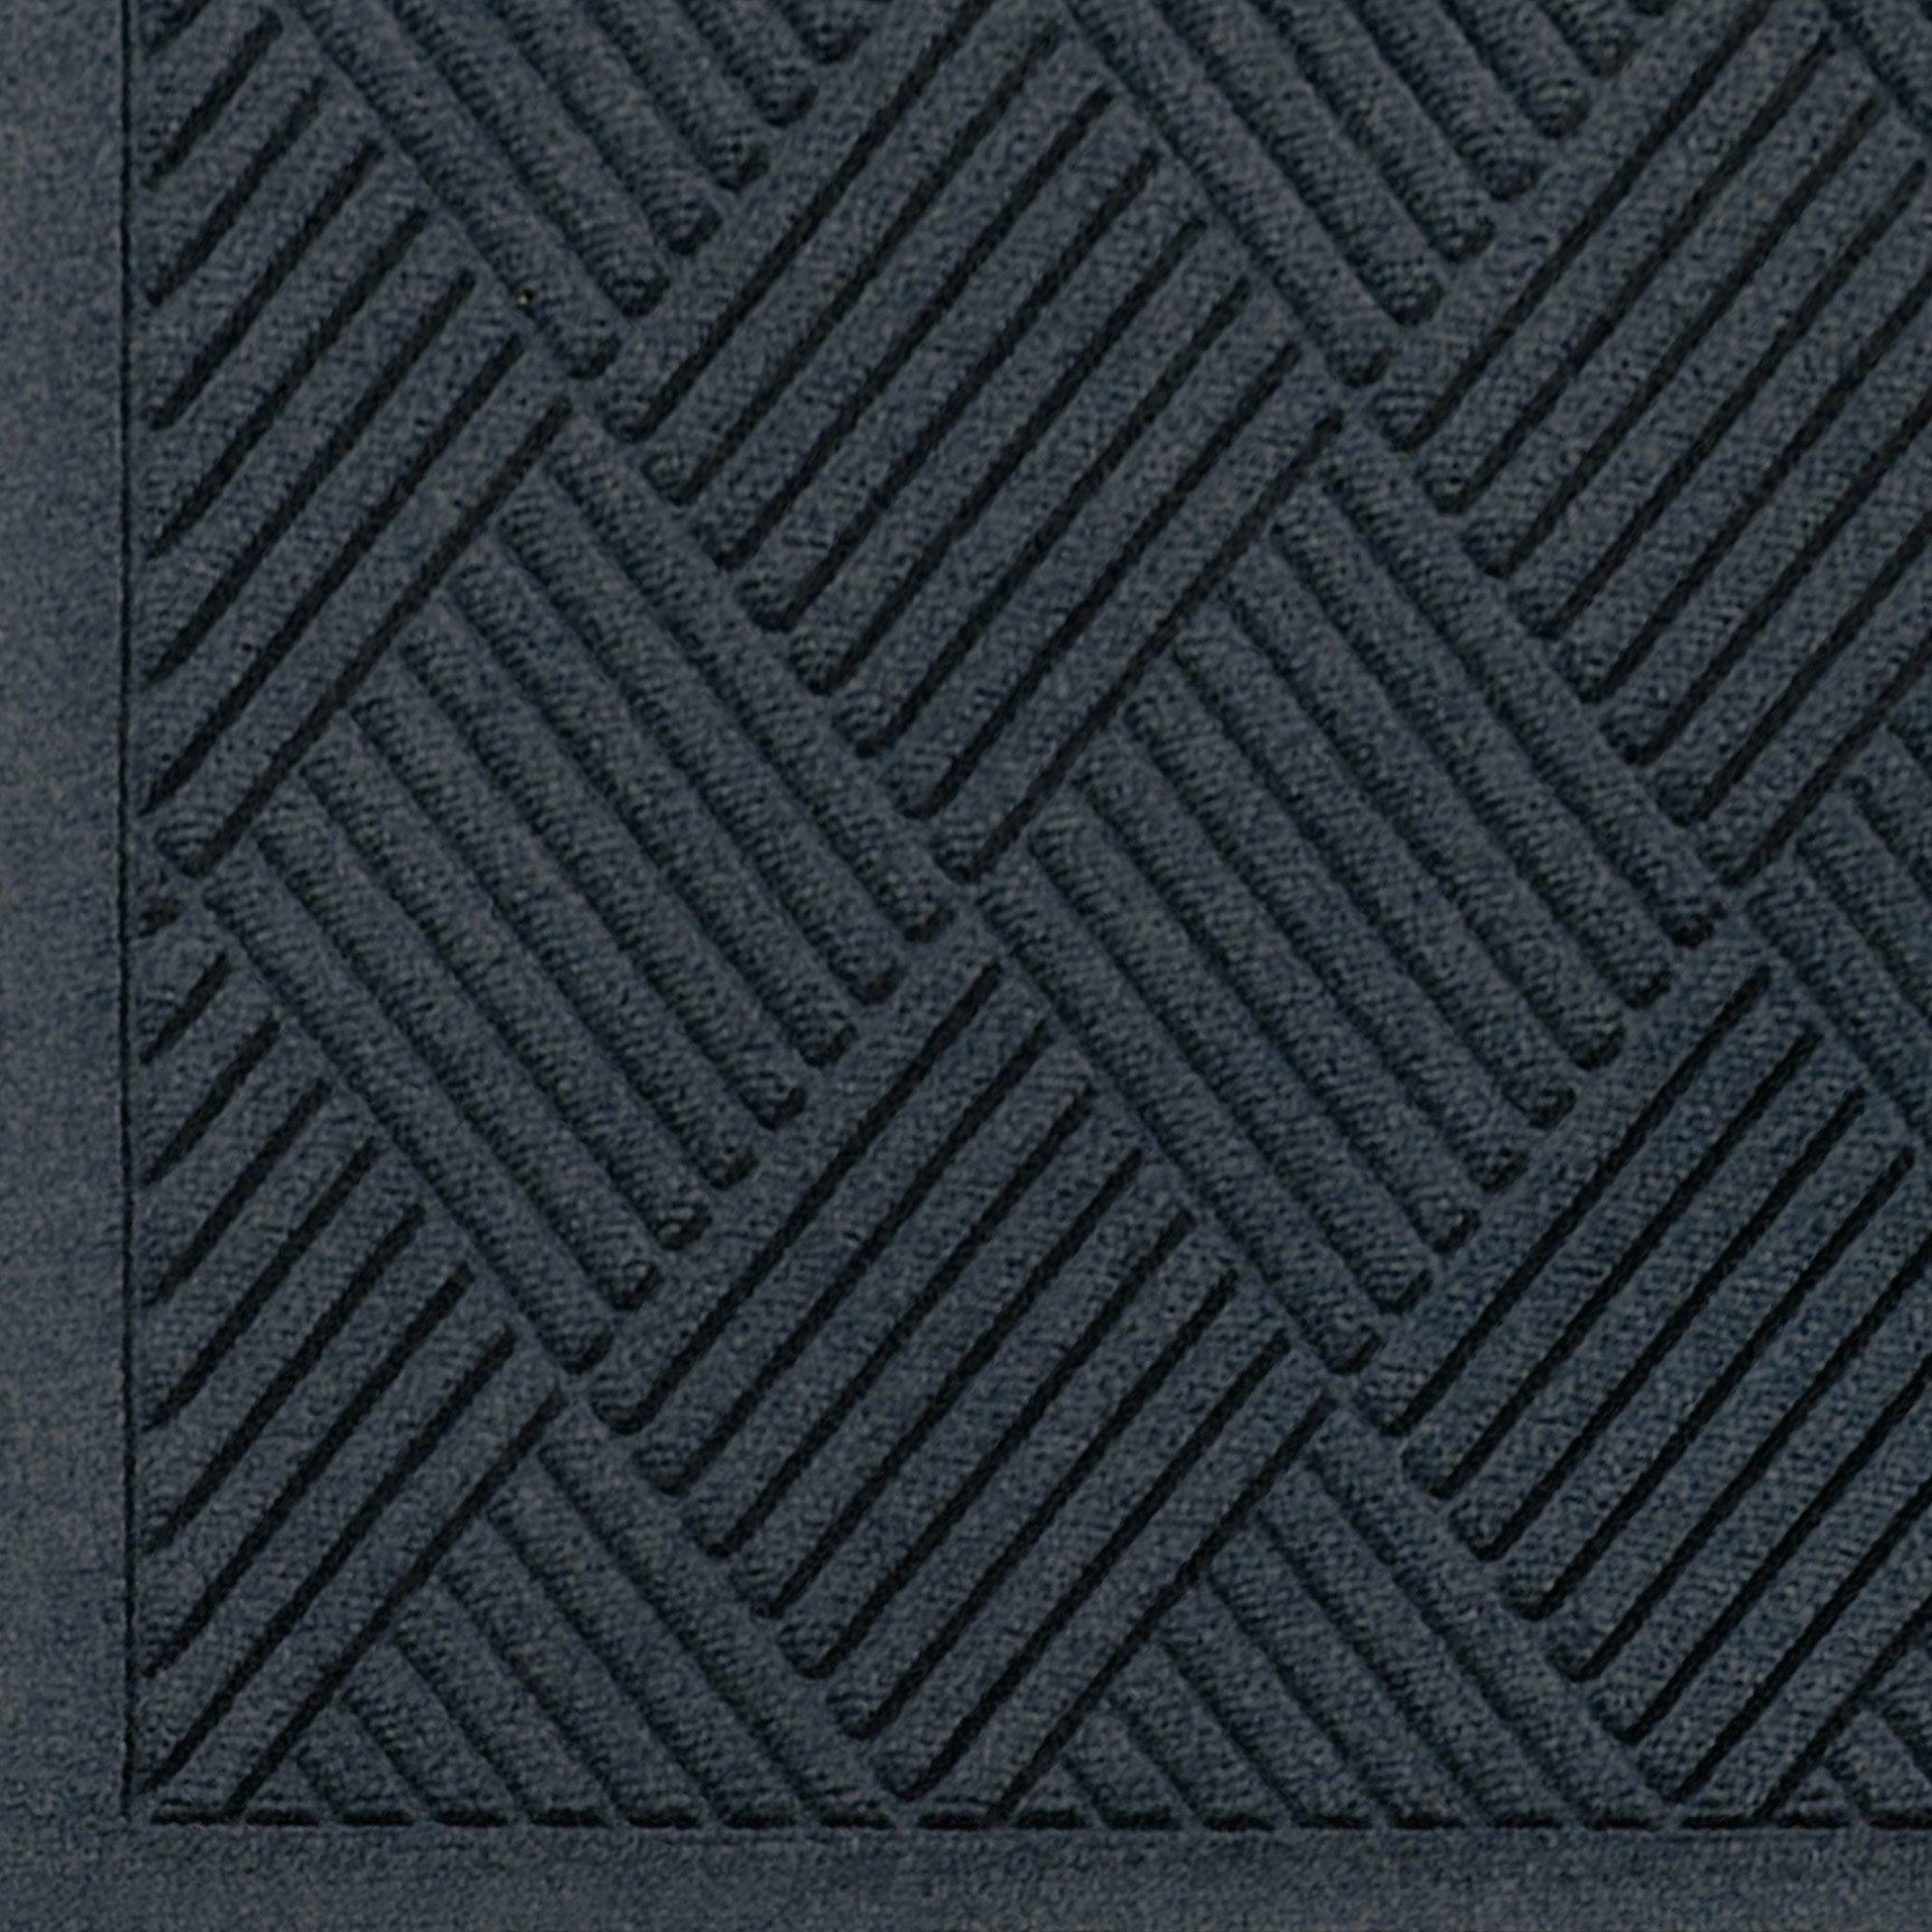 WaterHog Fashion Diamond-Pattern Commercial Grade Entrance Mat, Indoor/Outdoor Medium Brown Floor Mat 3' Length x 2' Width, Charcoal by M+A Matting by M+A Matting